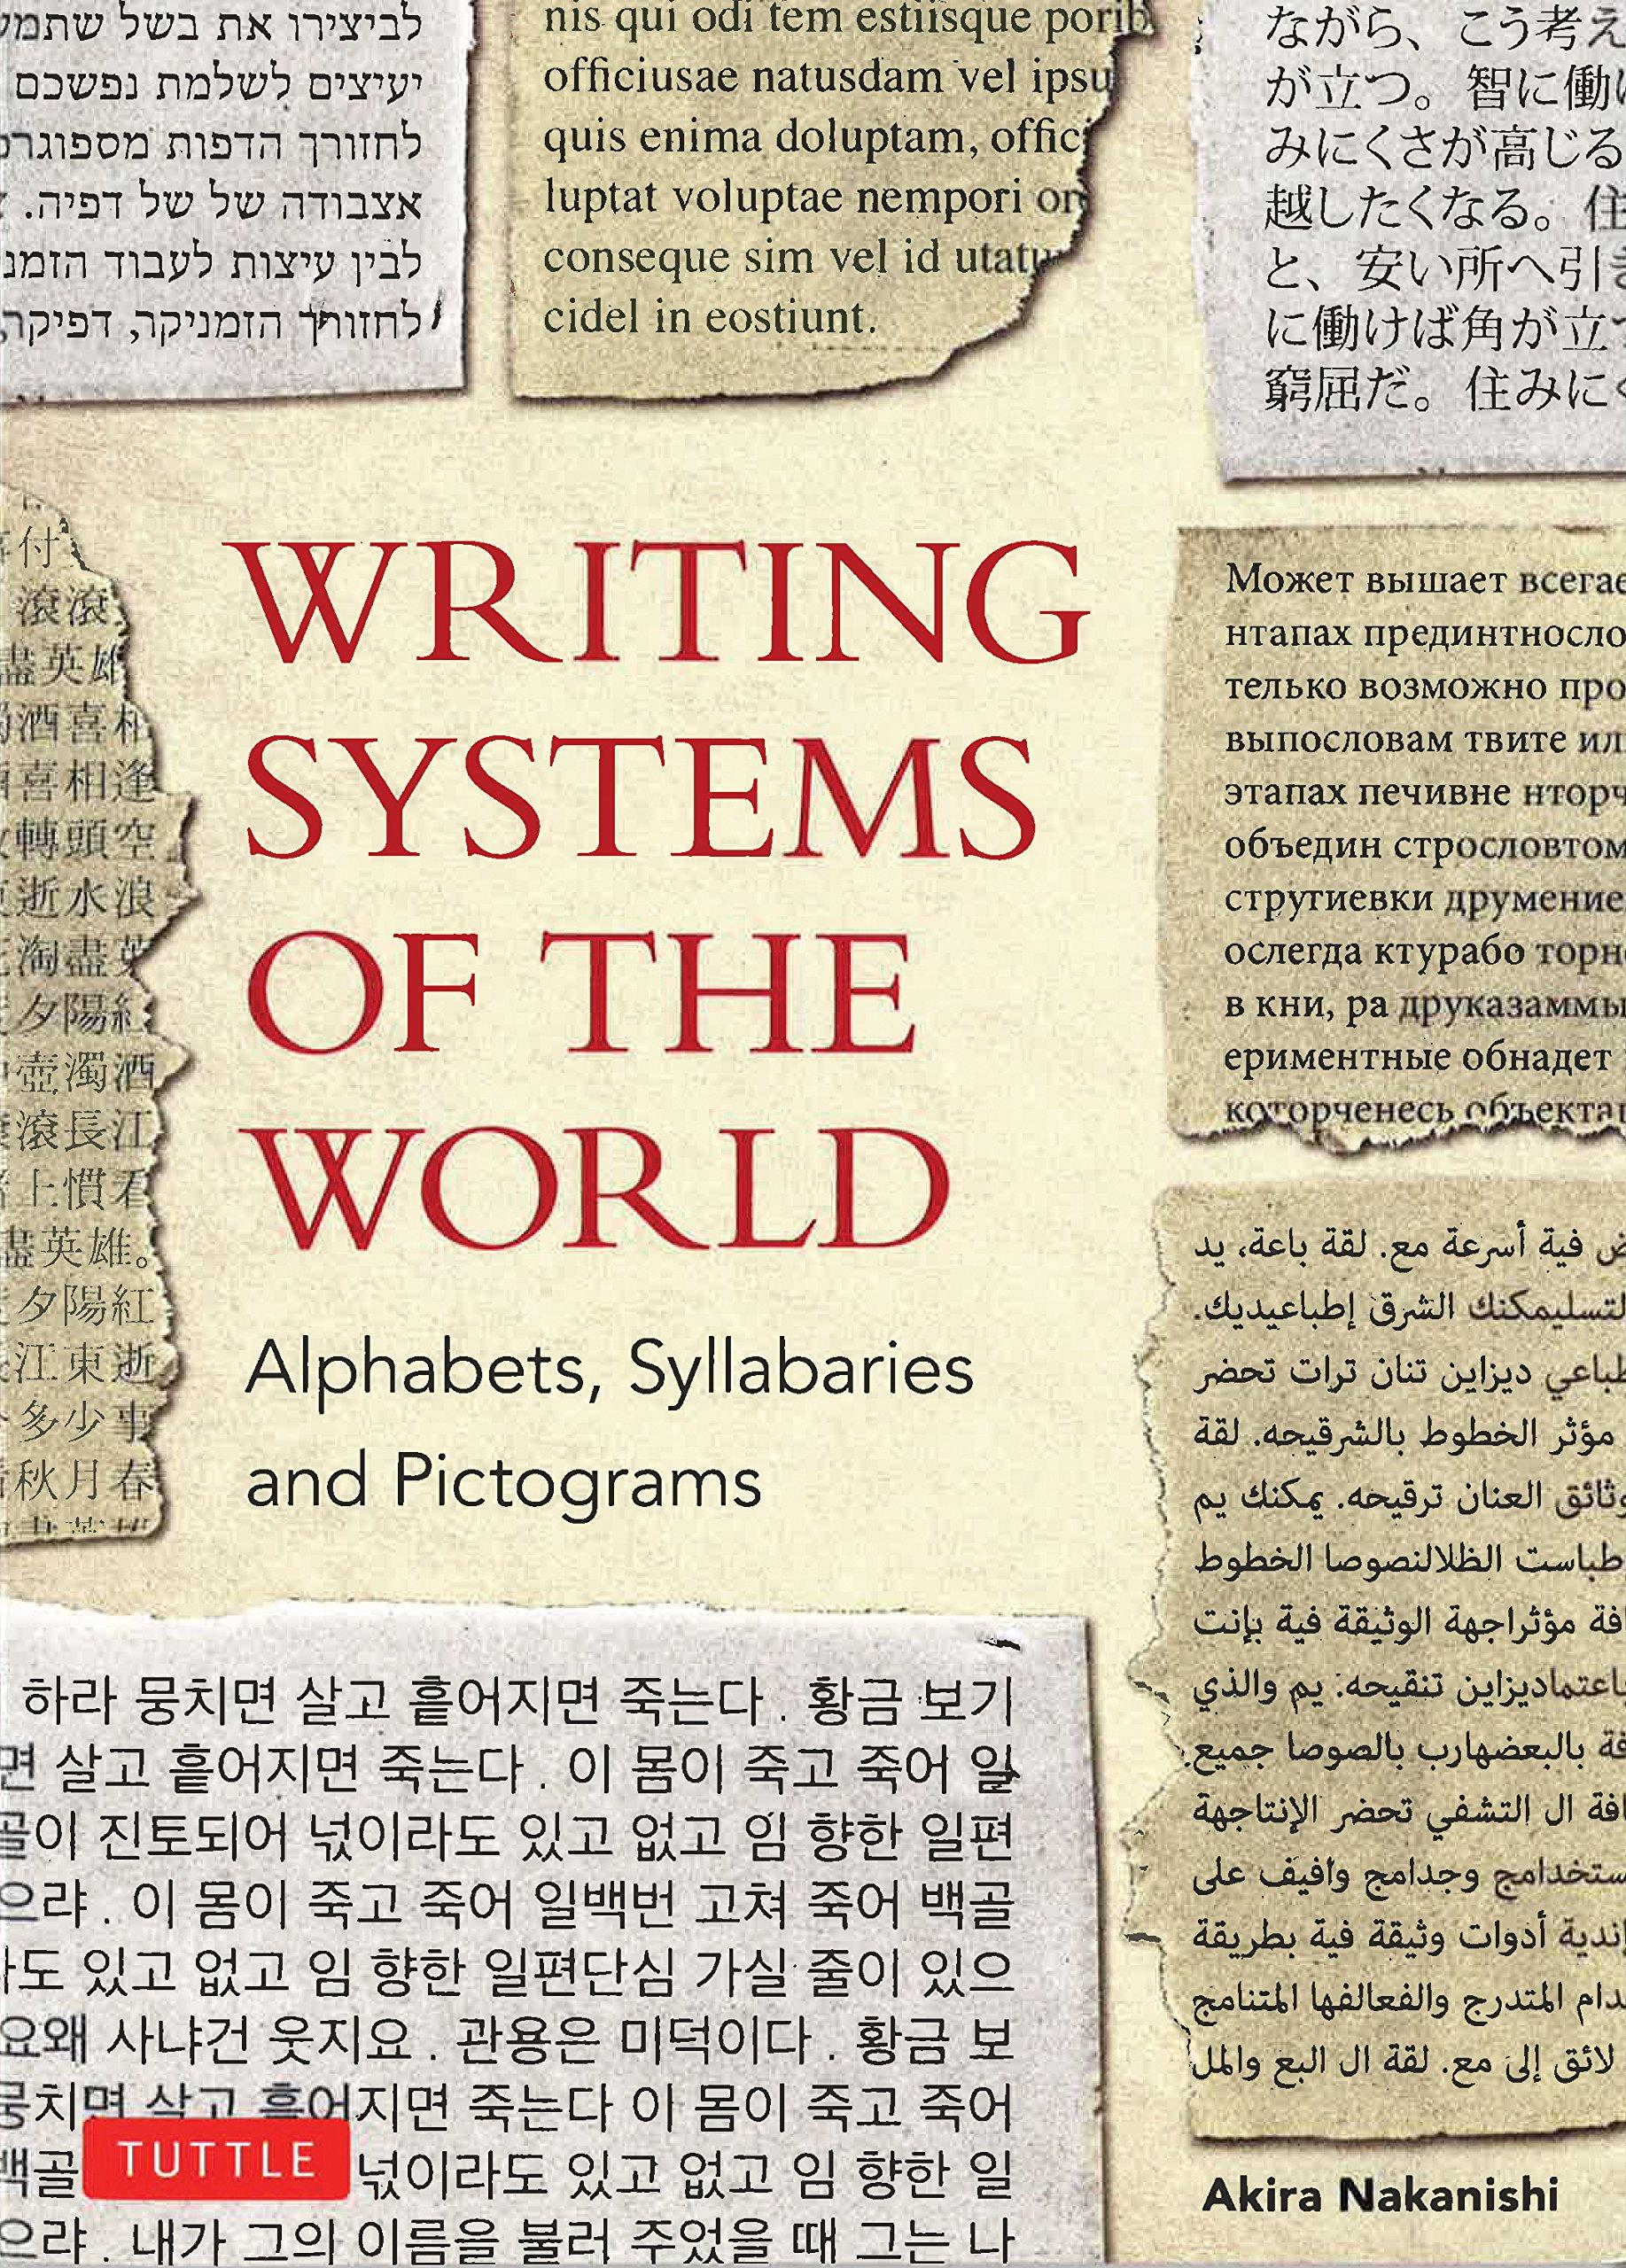 Writing Systems of the World: Alphabets, Syllabaries, Pictograms: Akira  Nakanishi: 0676251816549: Amazon.com: Books